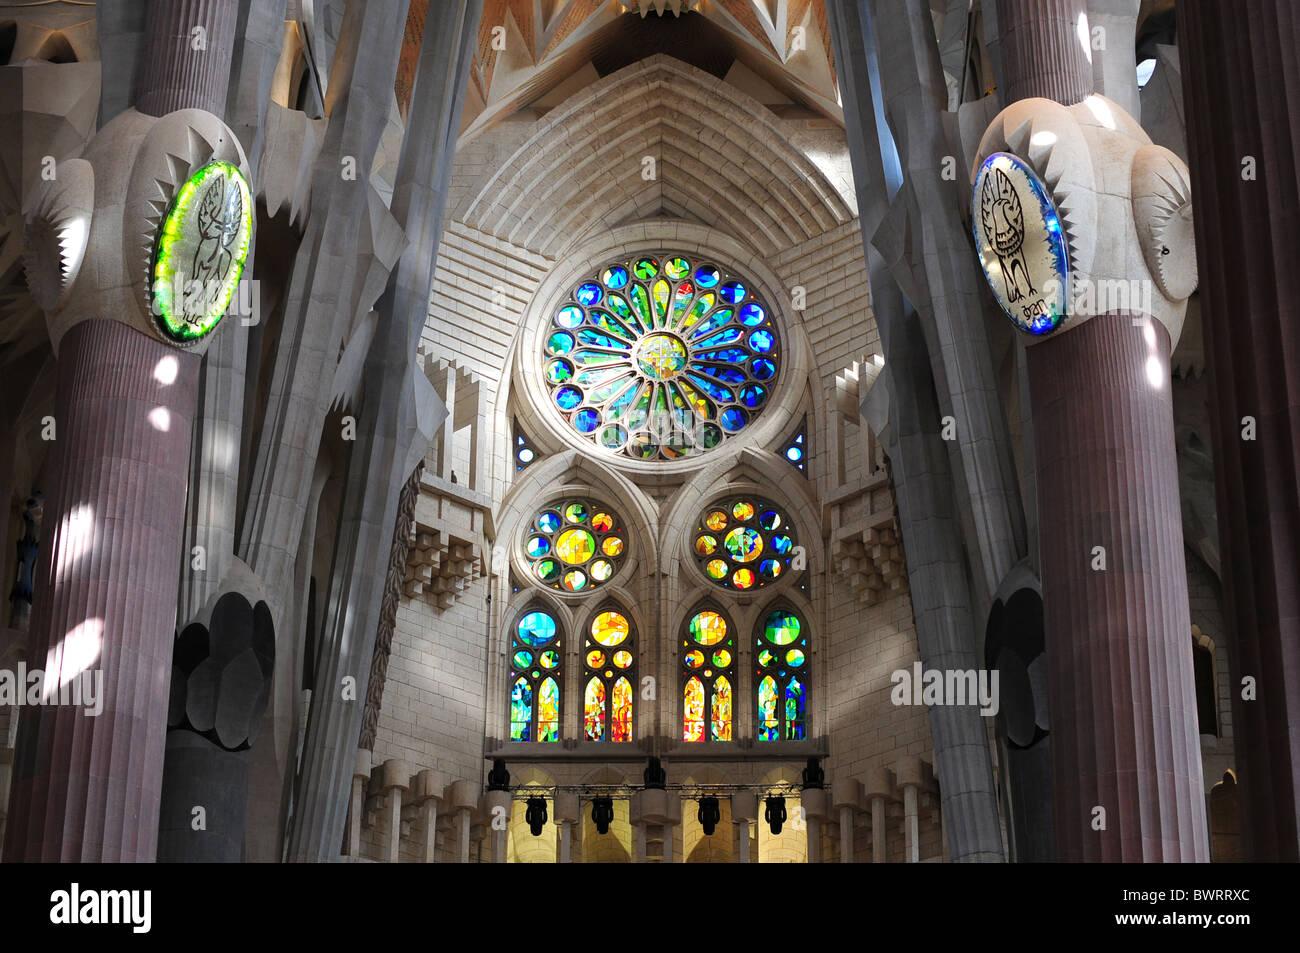 Sagrada Familia Antoni Gaudí Barcelona Spain Catalonia - Stock Image